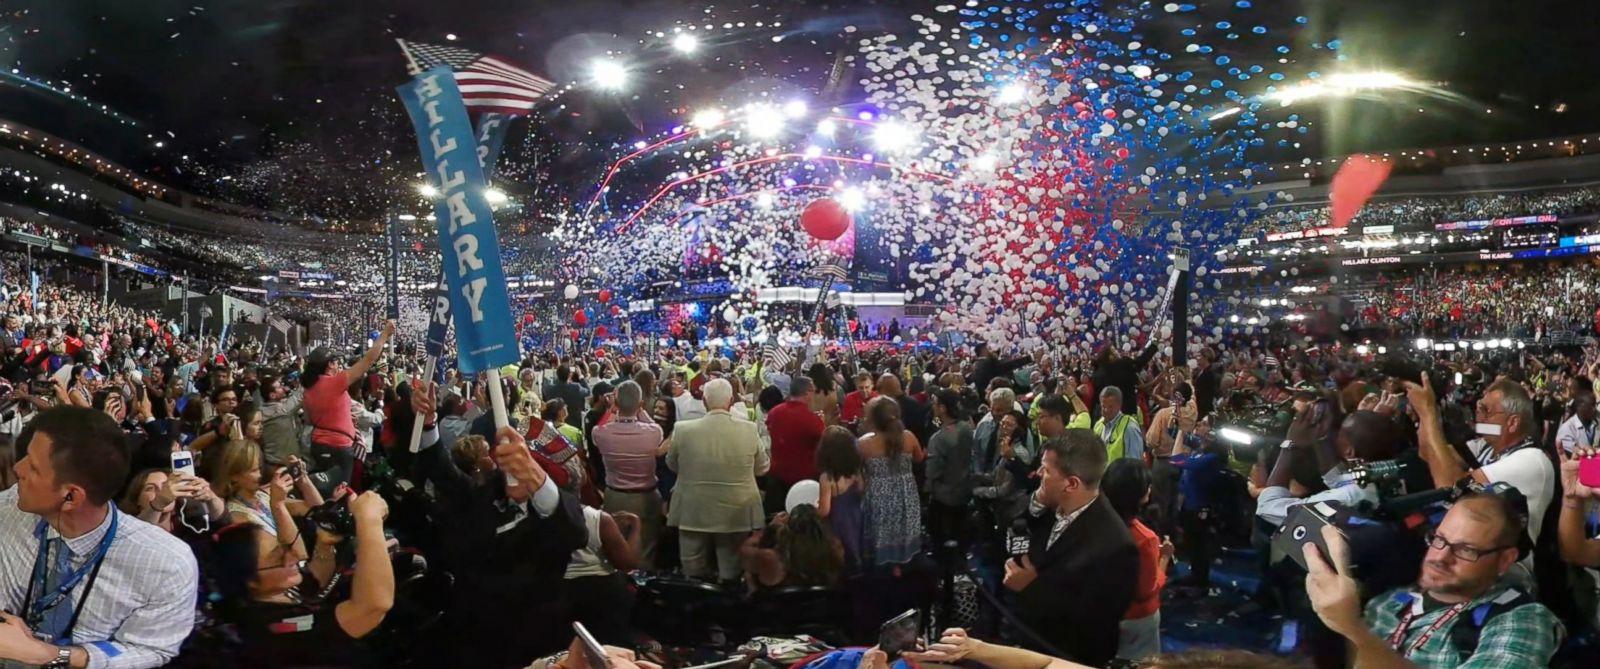 PHOTO: 2016 Democratic National Convention ball drop